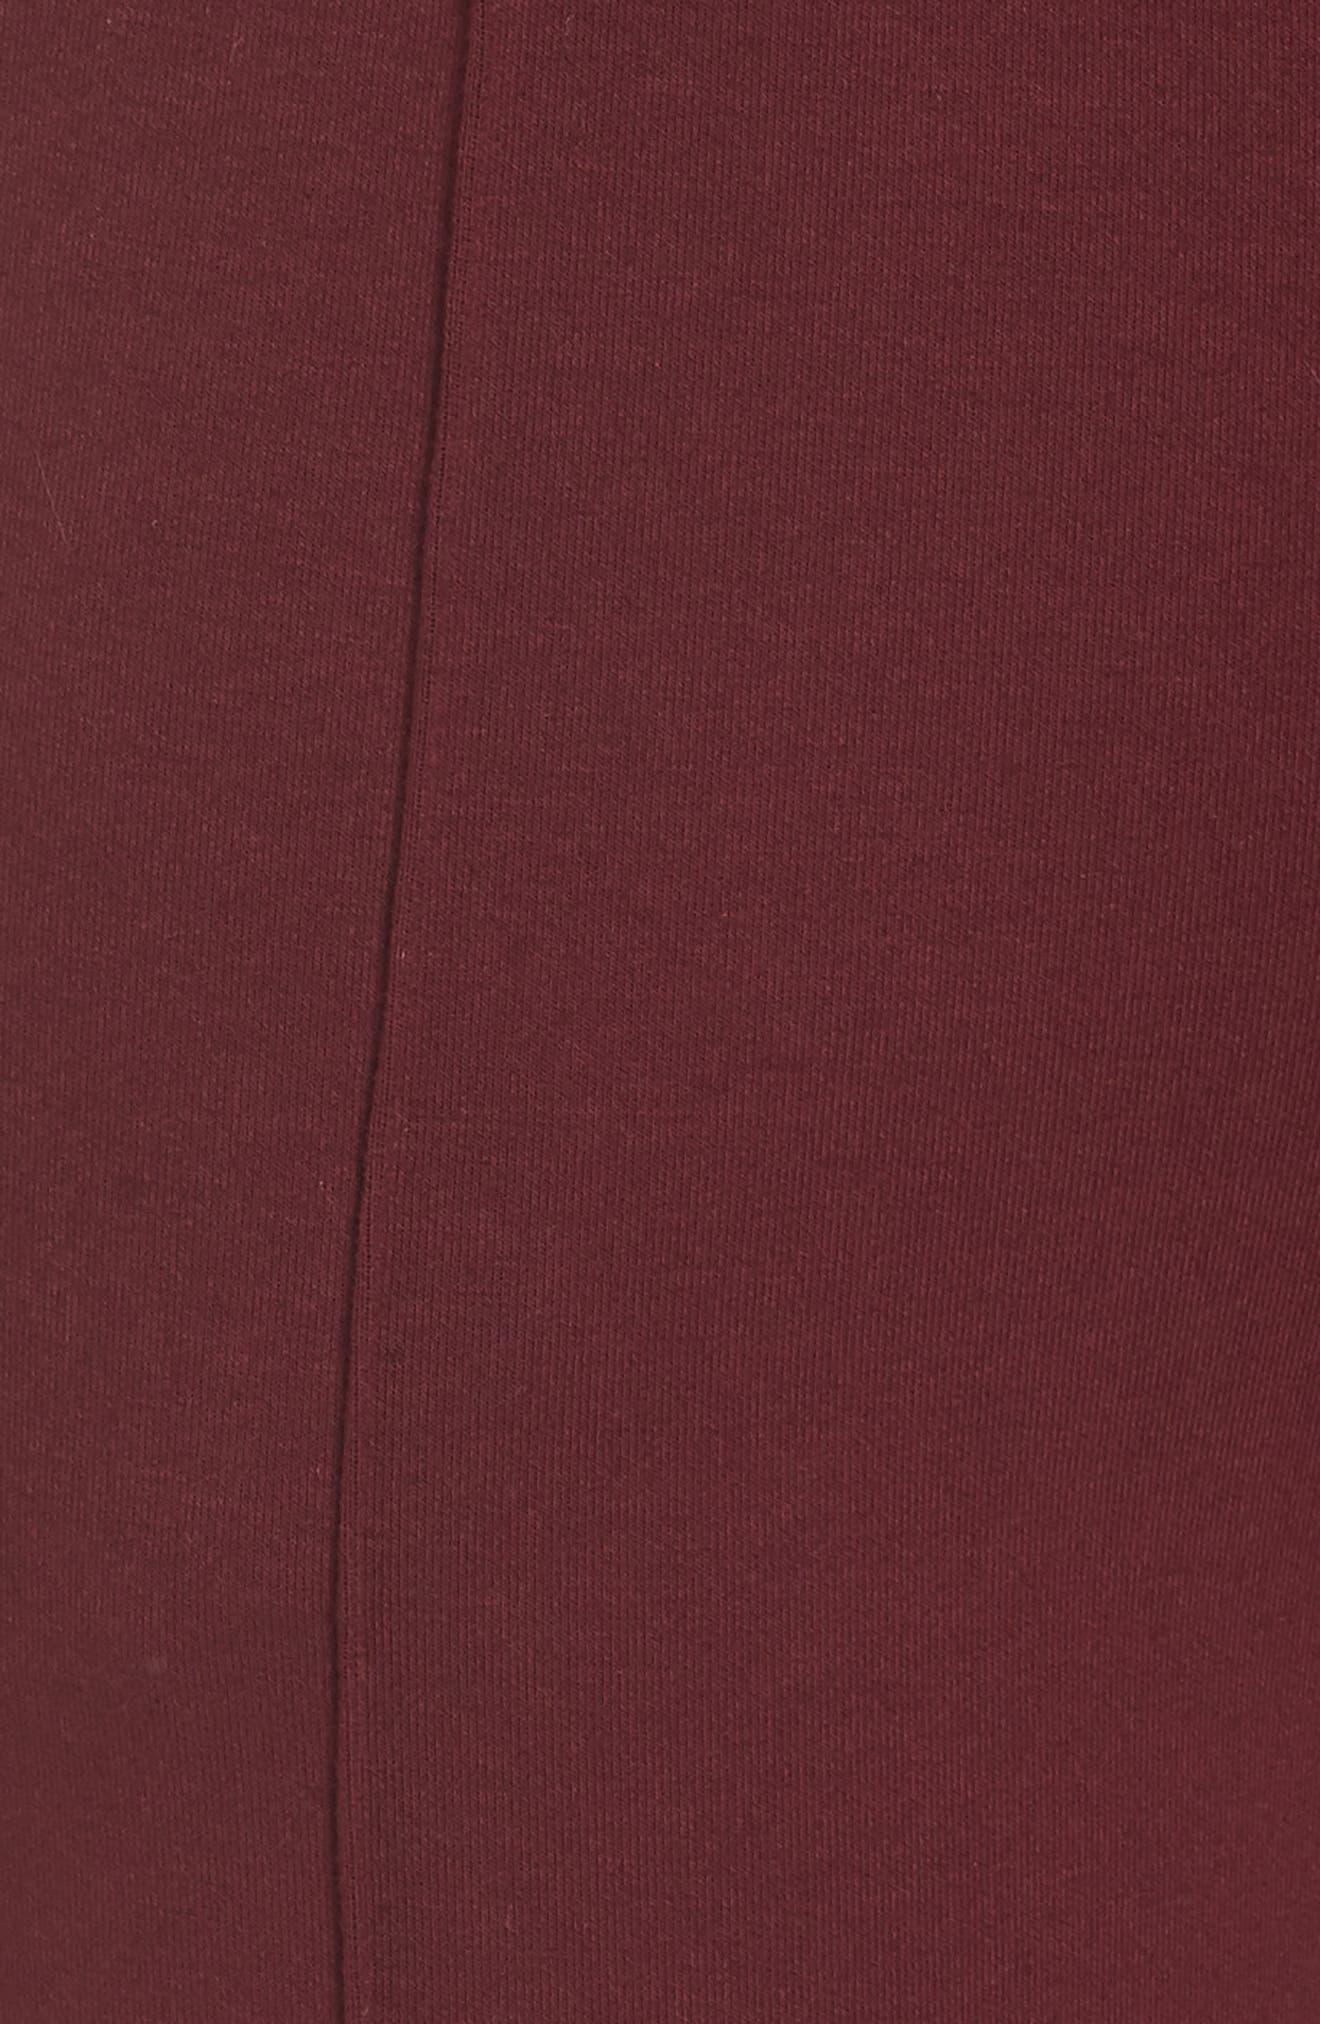 ADIDAS ORIGINALS,                             SST Track Pants,                             Alternate thumbnail 6, color,                             930